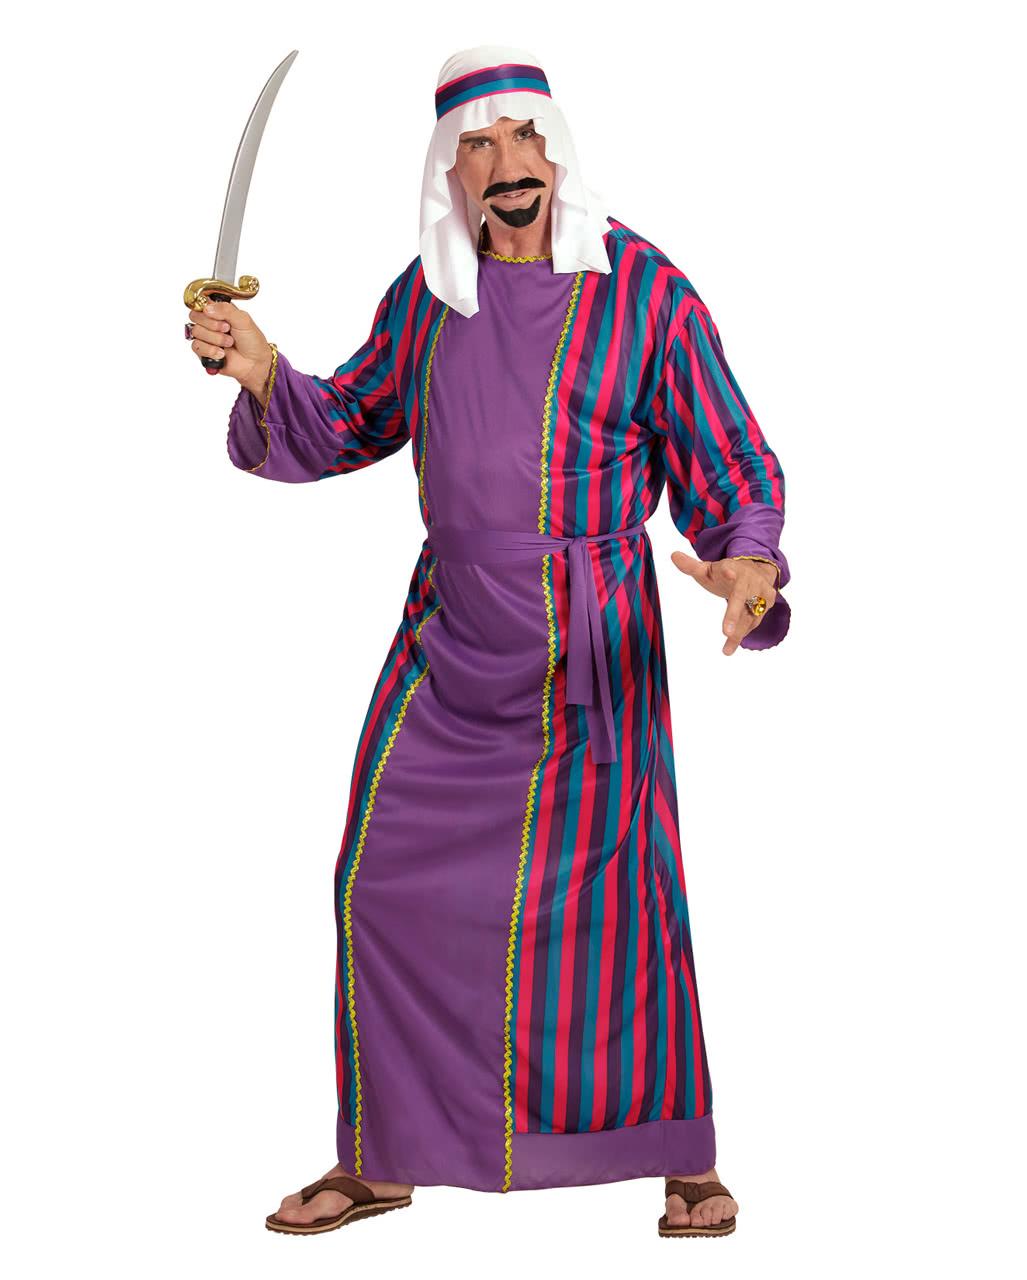 arab sheik costume 3 pcs. as sultan costume | horror-shop